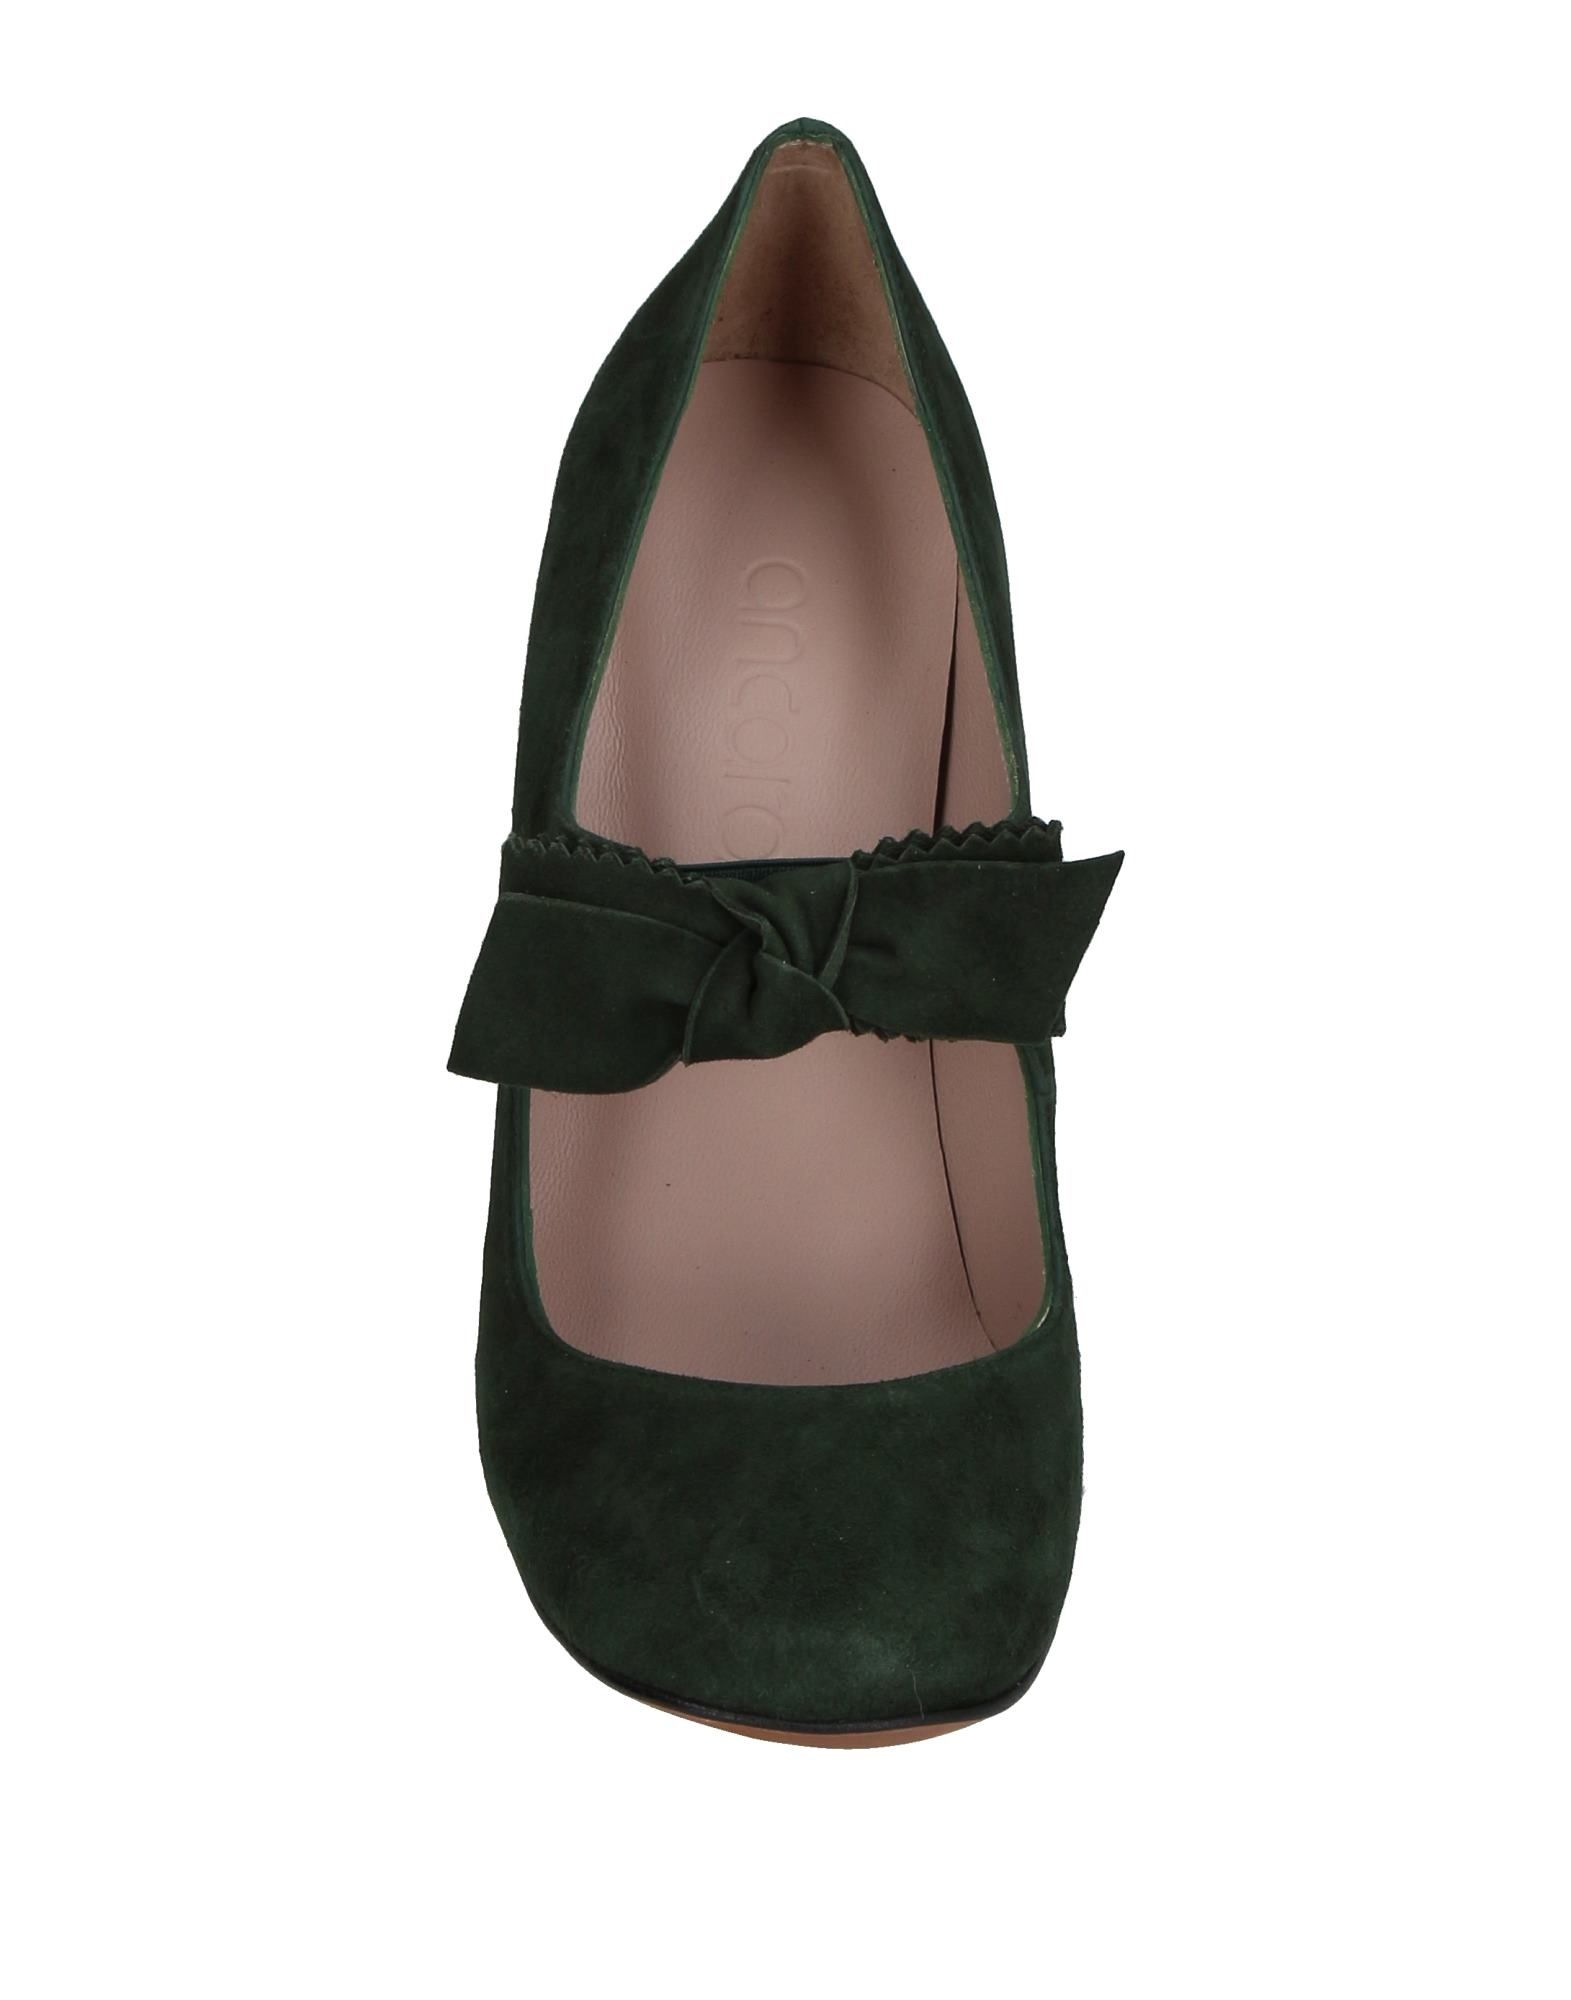 Ancarani Schuhe Pumps Damen  11226362MP Gute Qualität beliebte Schuhe Ancarani 7ebdf1